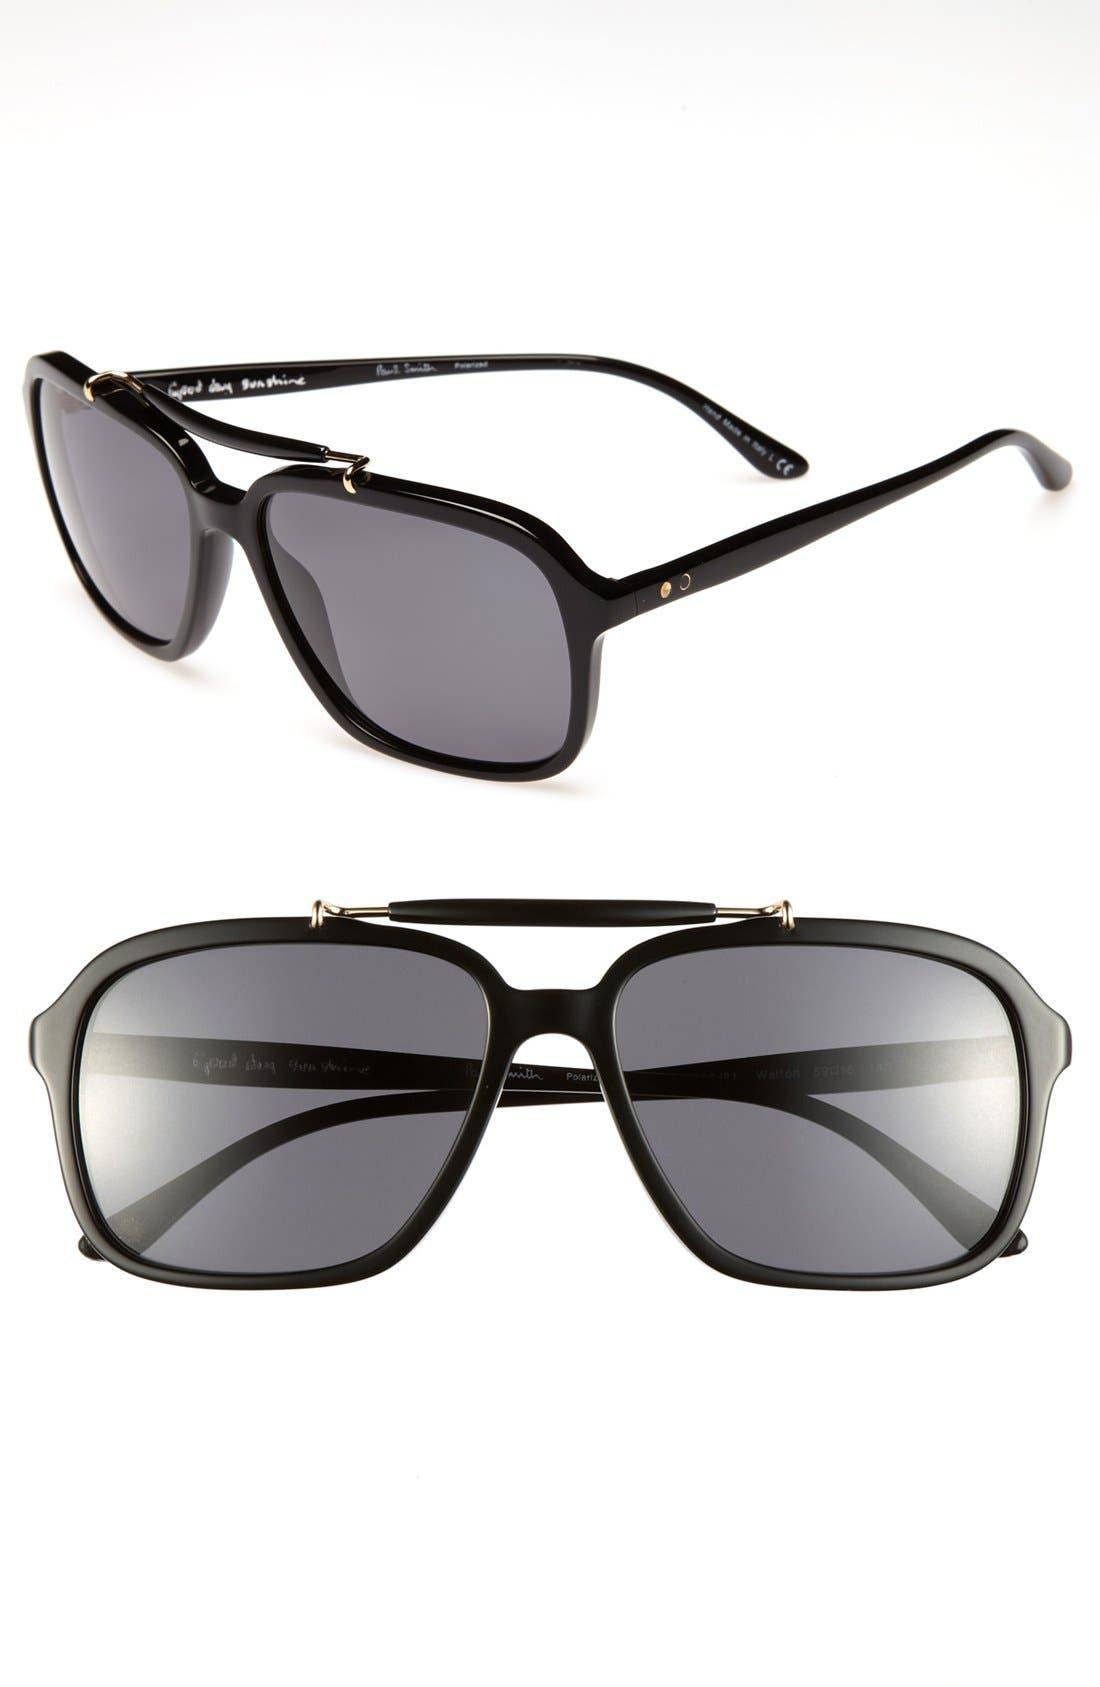 Alternate Image 1 Selected - Paul Smith 'Walton' 59mm Polarized Sunglasses